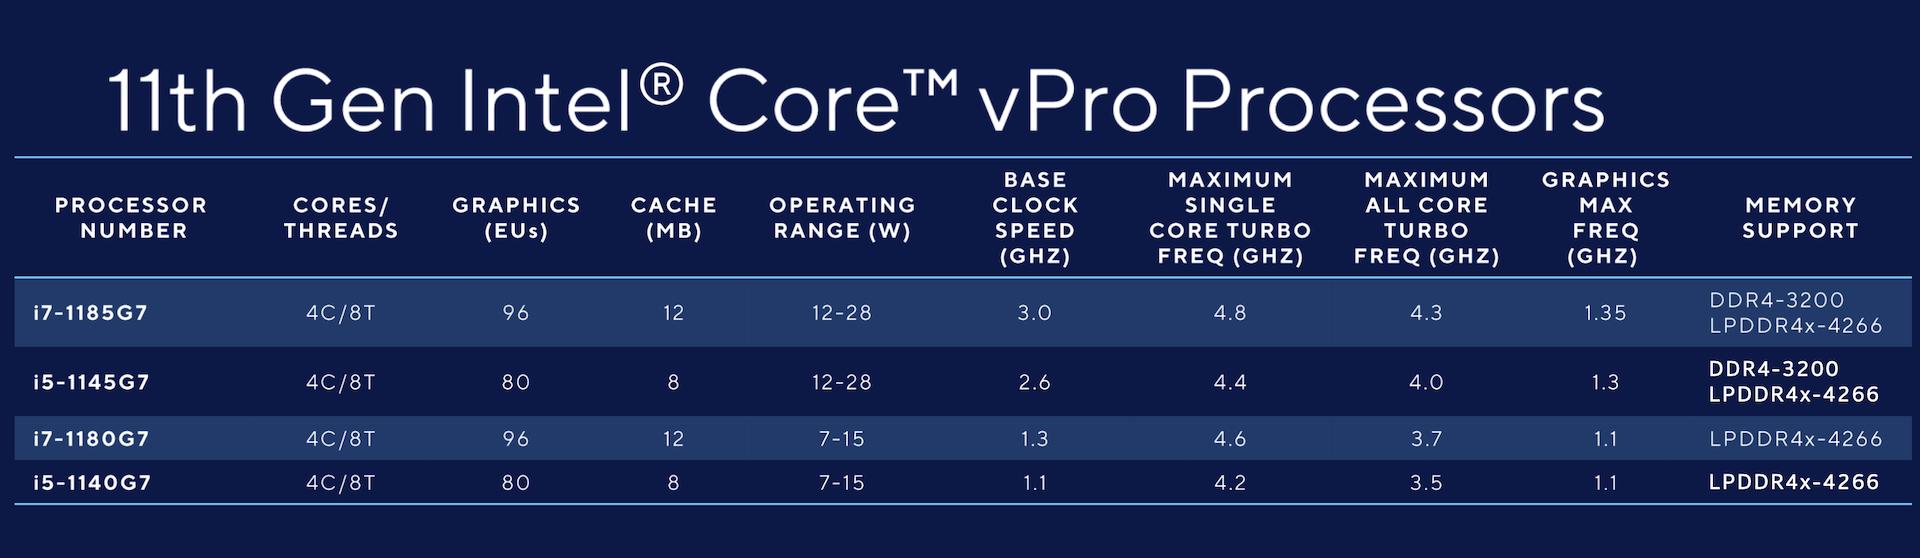 Intel vPRO cpus